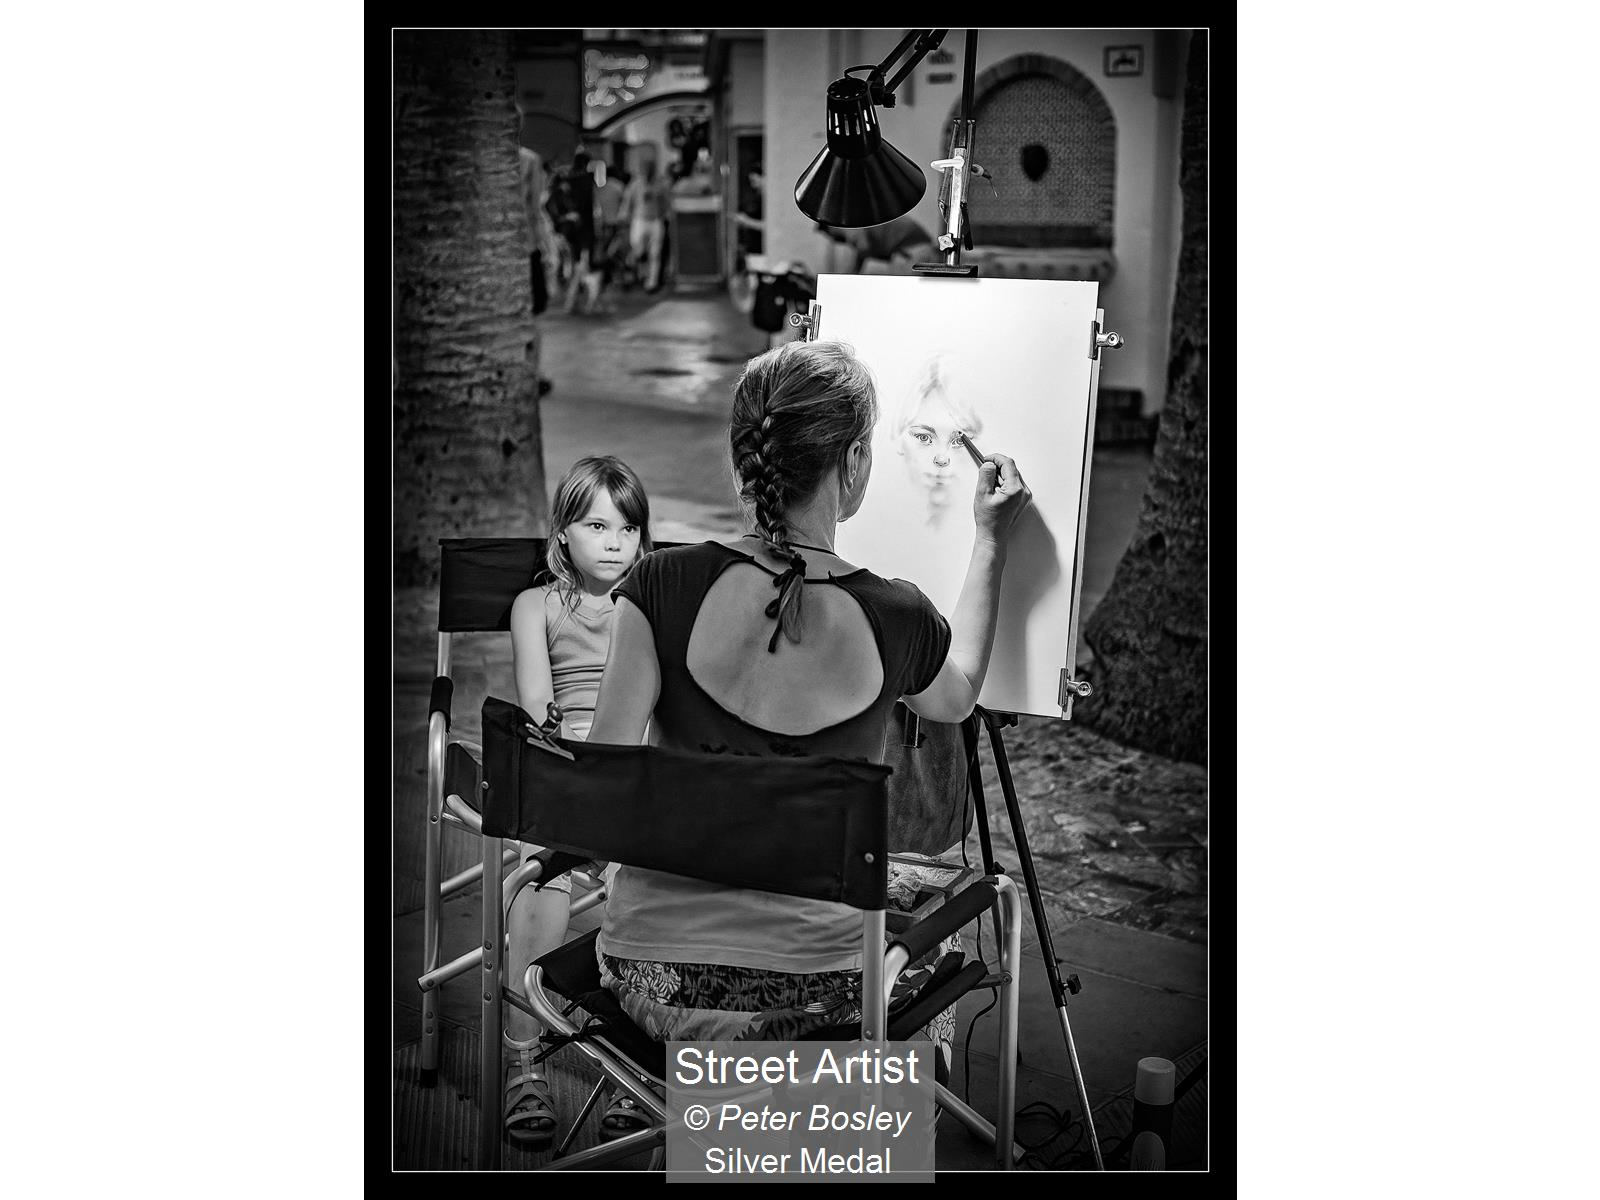 Street Artist_Peter Bosley_Silver